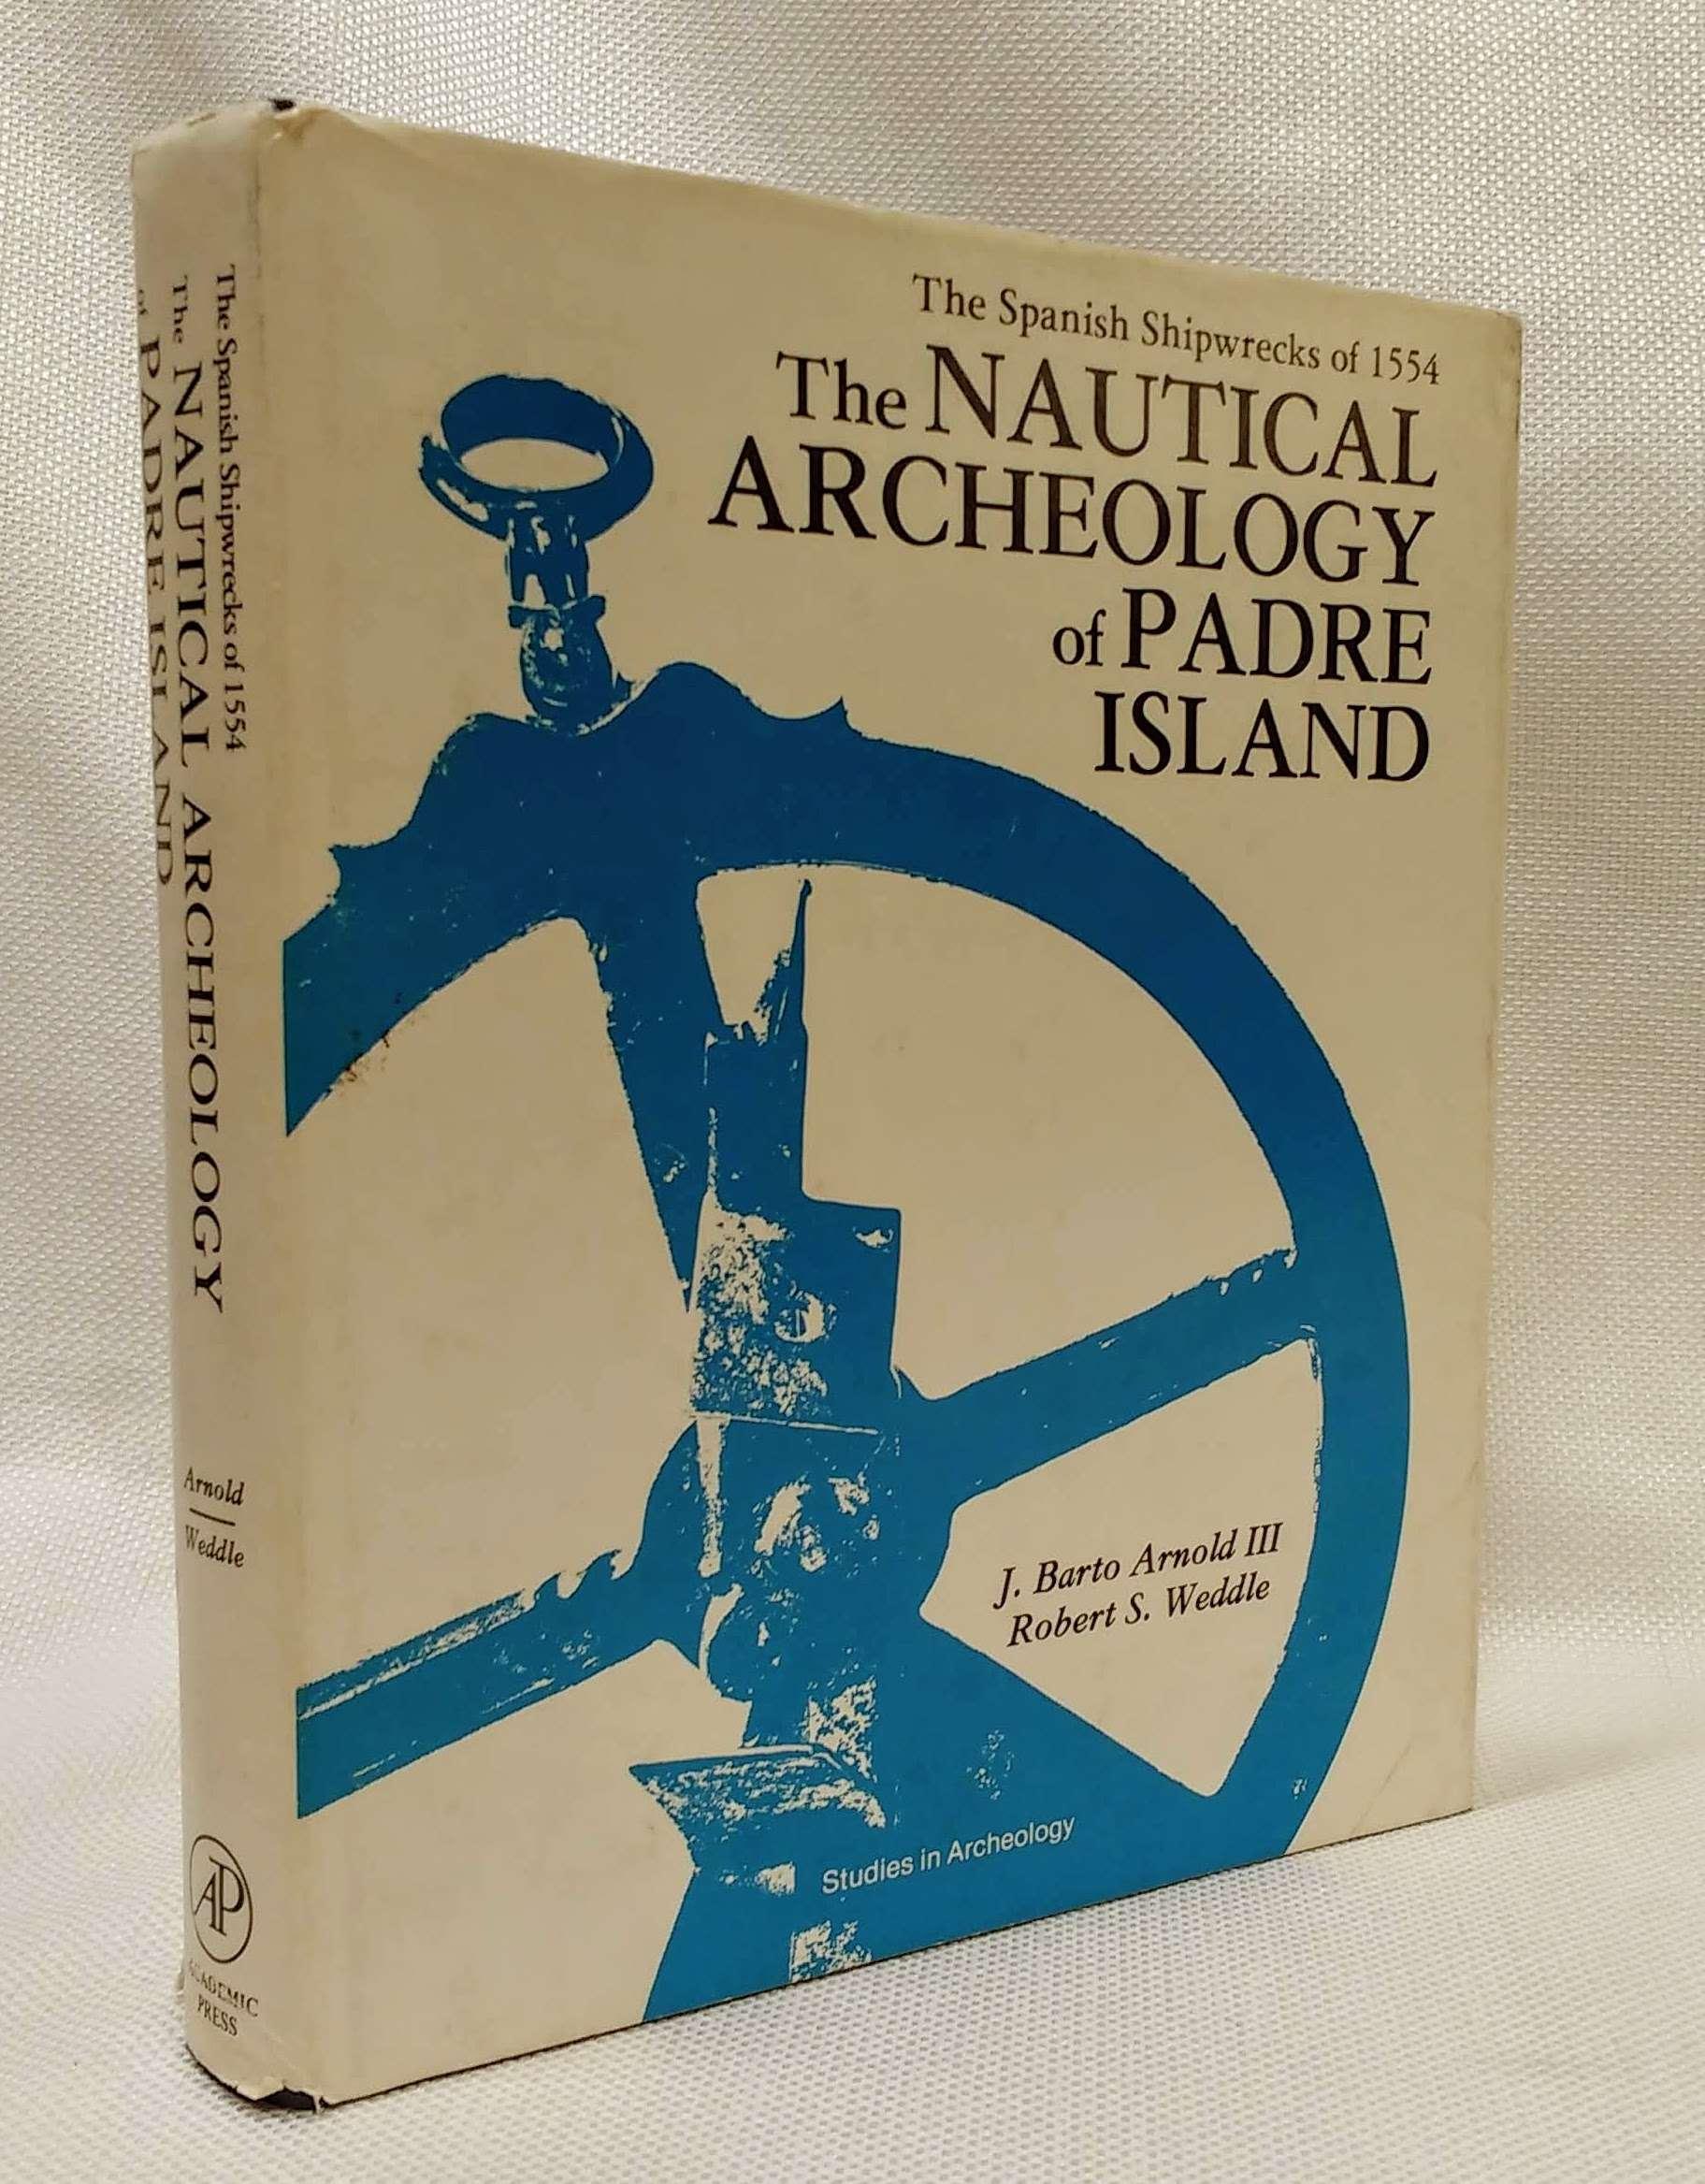 The Nautical Archeology of Padre Island: The Spanish Shipwrecks of 1554 (Studies in archeology), Arnold, J. Barto, III; Weddle, Robert